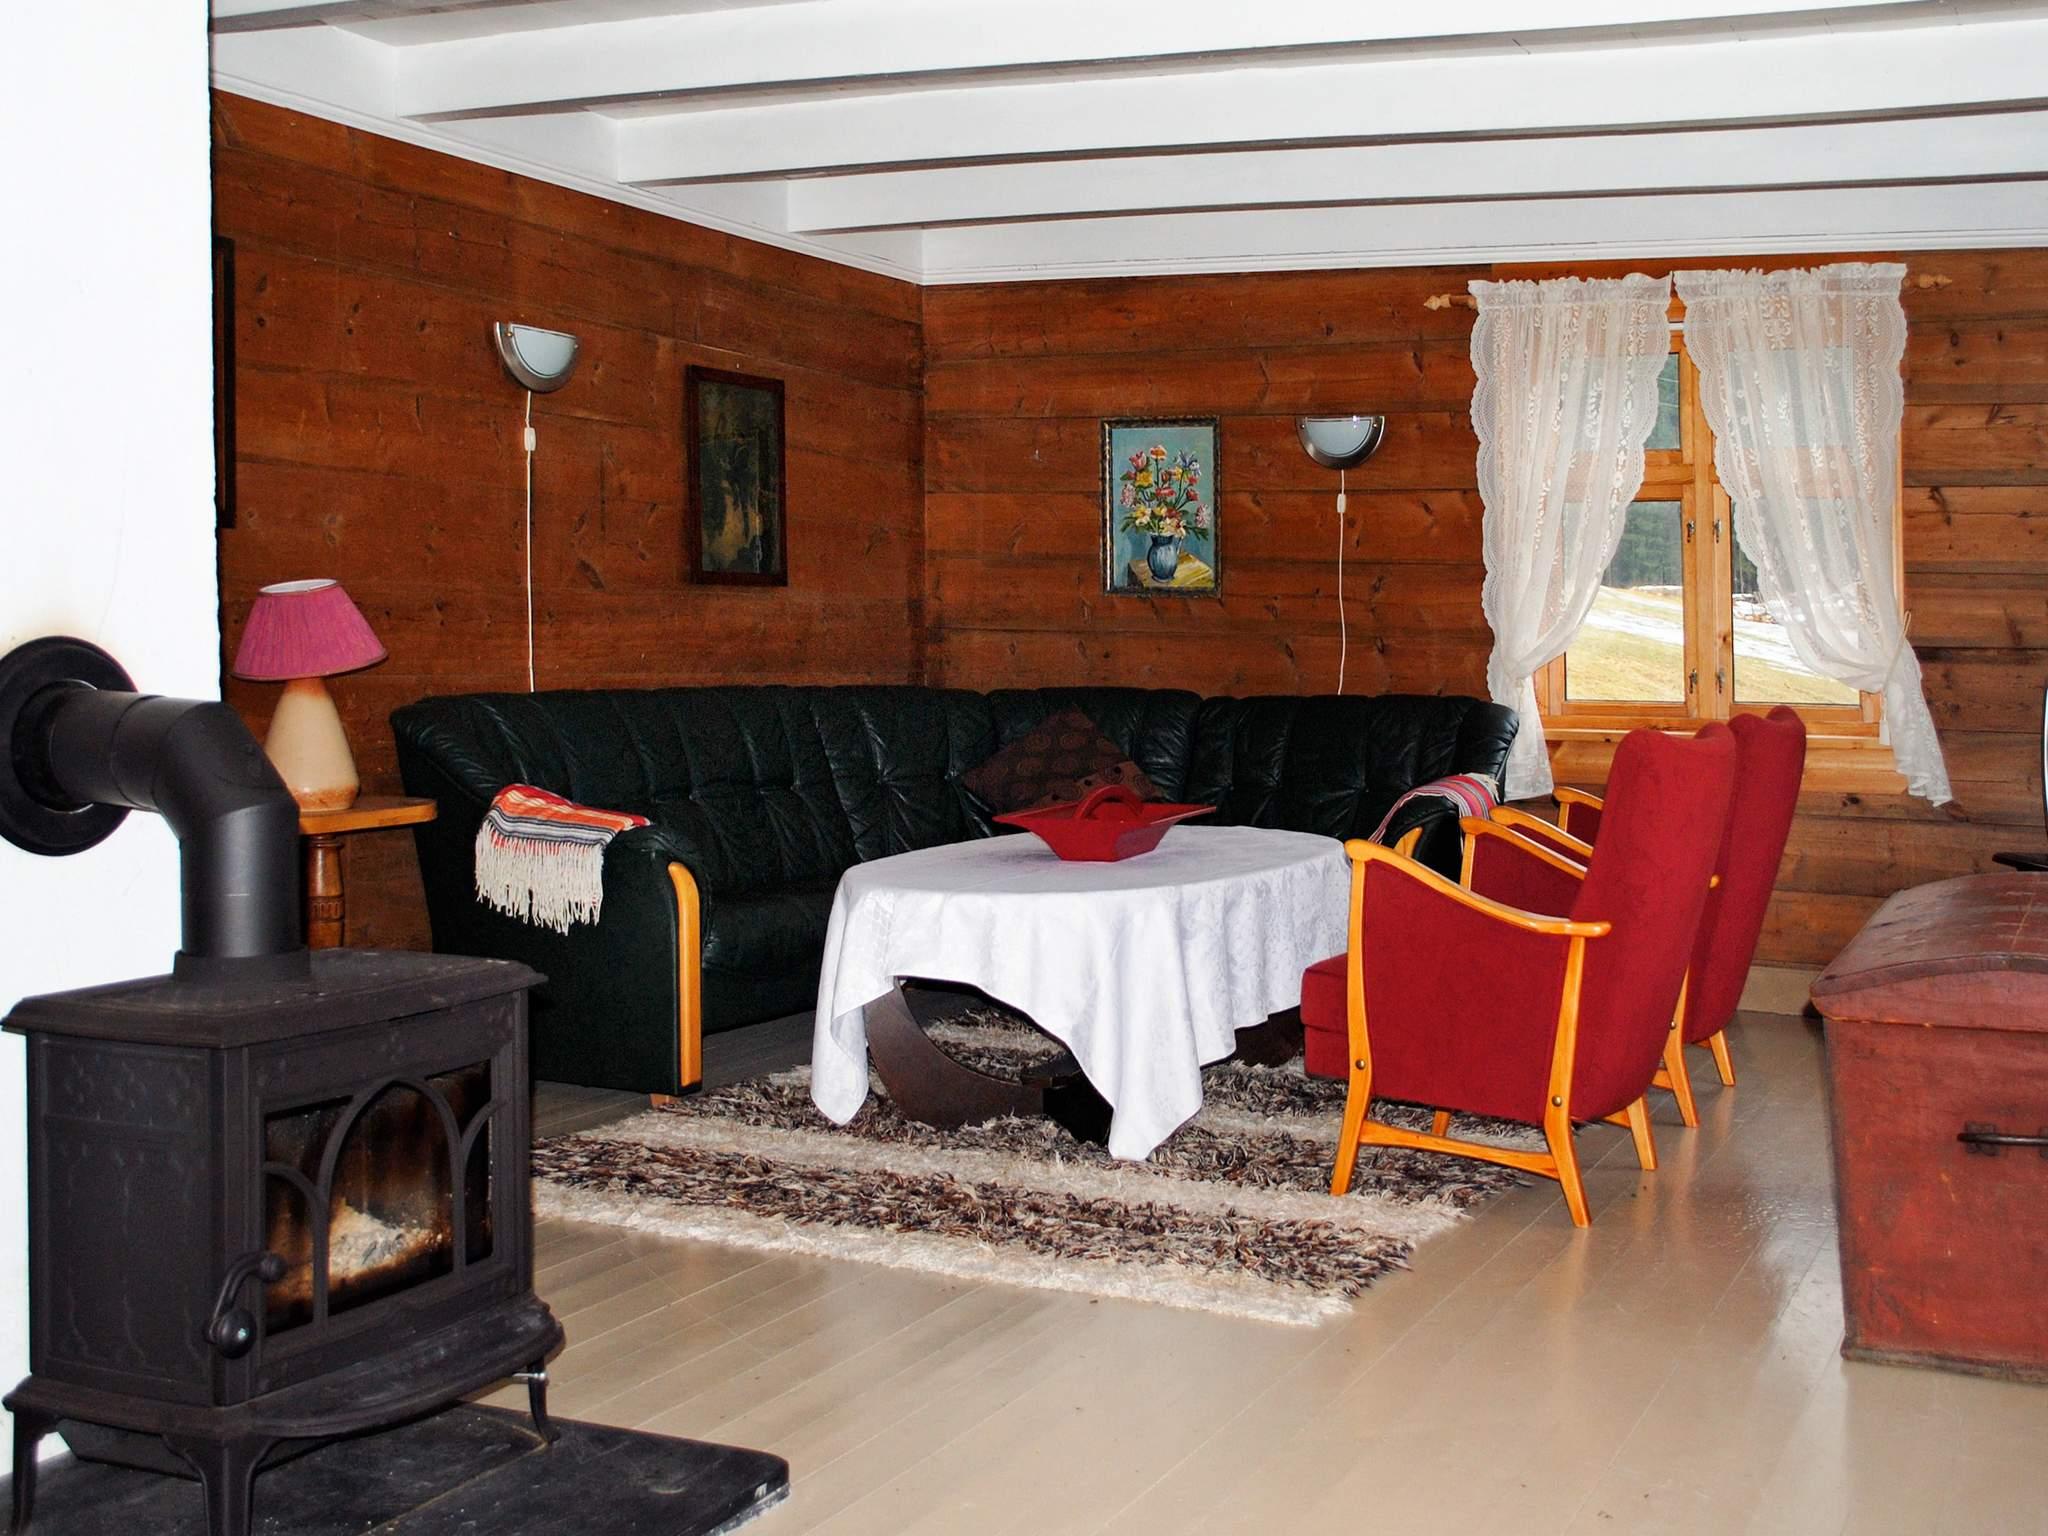 Ferienhaus Etne (83639), Etne, Hordaland - Hardangerfjord, Westnorwegen, Norwegen, Bild 2